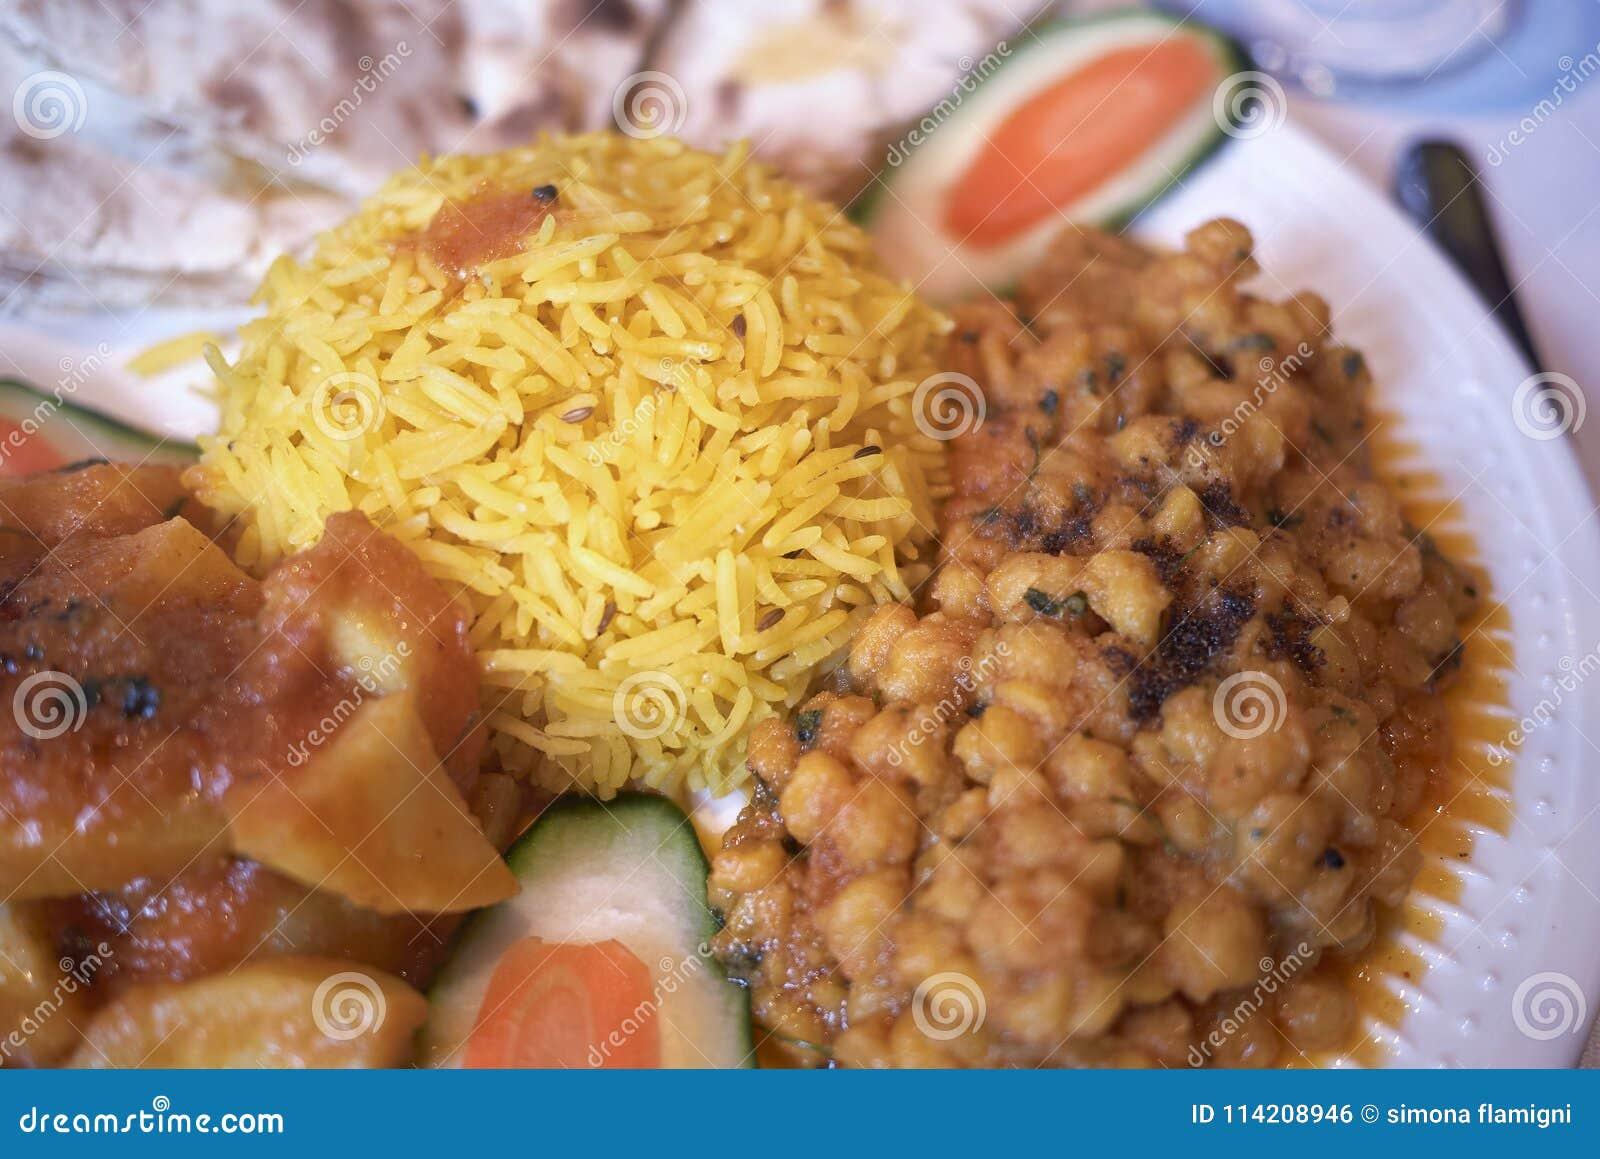 Assorted vegetarian indian meal